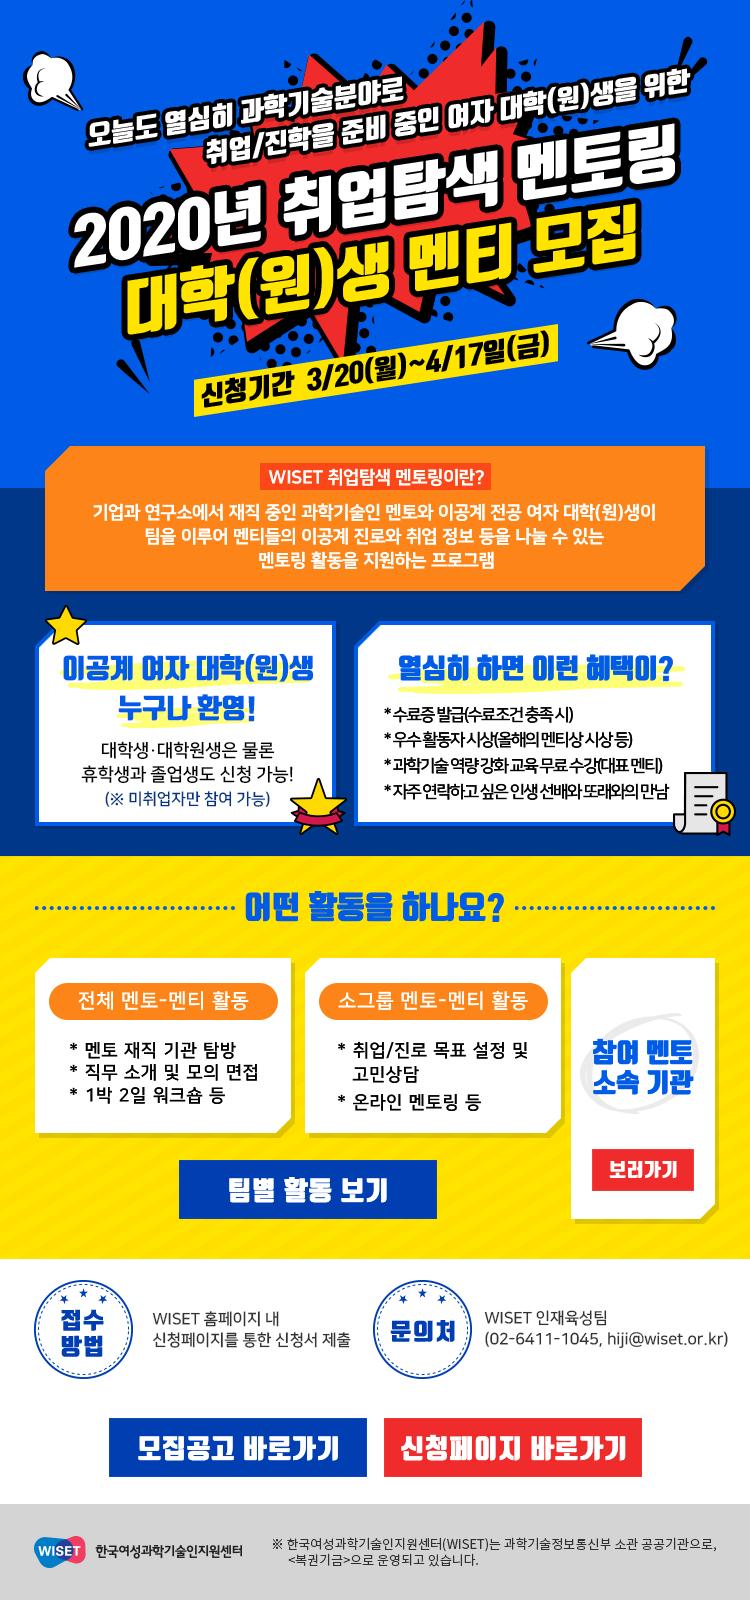 2. WISET 취업탐색 멘토링 멘티 모집 초청장.png